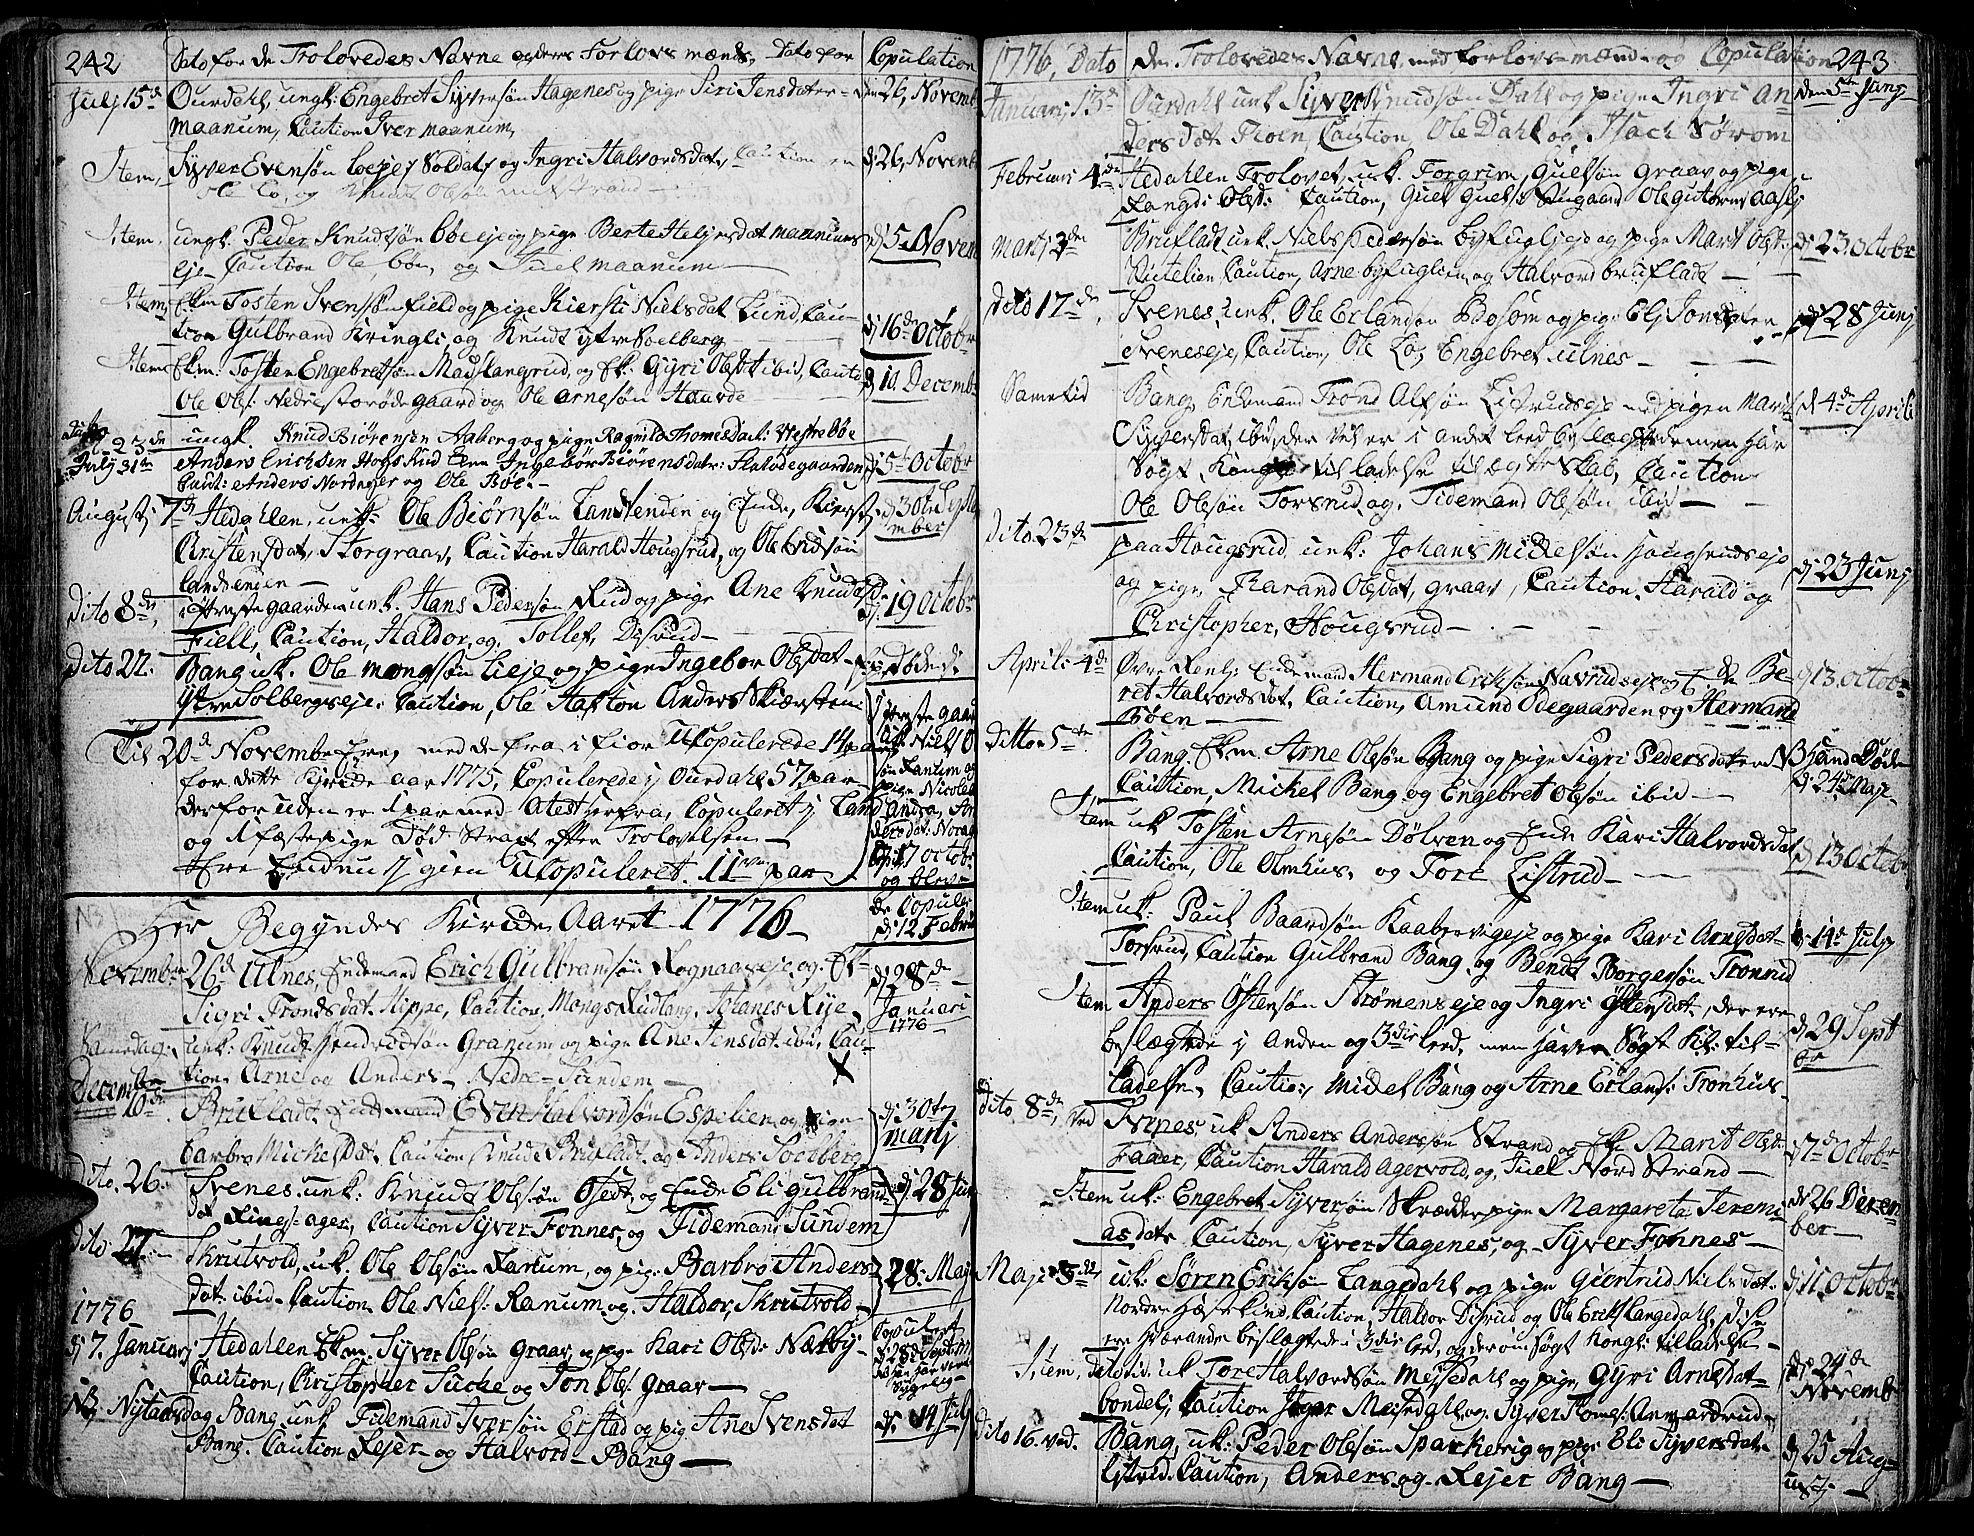 SAH, Aurdal prestekontor, Ministerialbok nr. 5, 1763-1781, s. 242-243